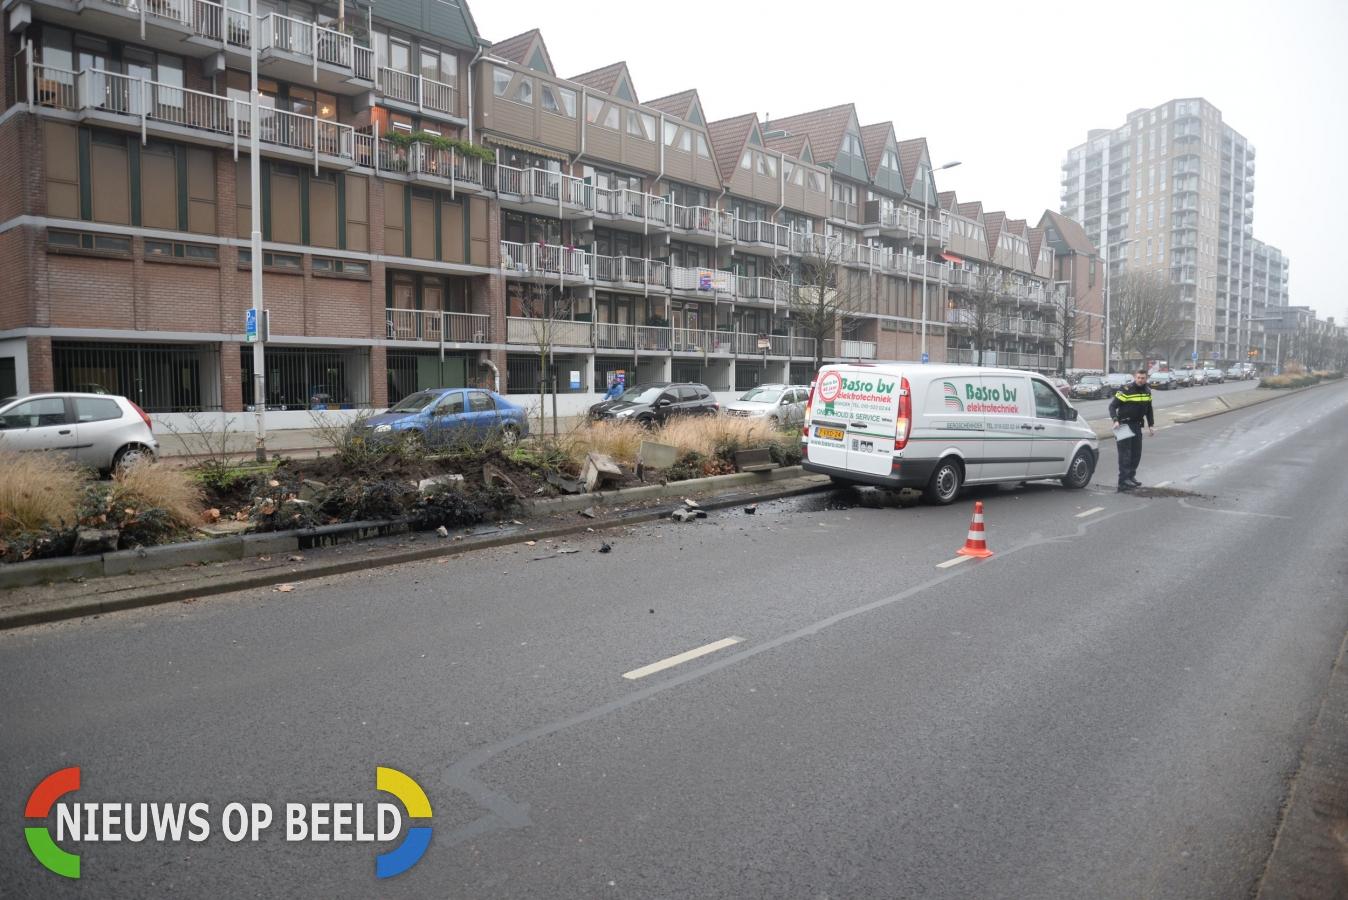 Bestuurder bestelbus rijdt volledige bloembak aan gort Pompenburg Rotterdam